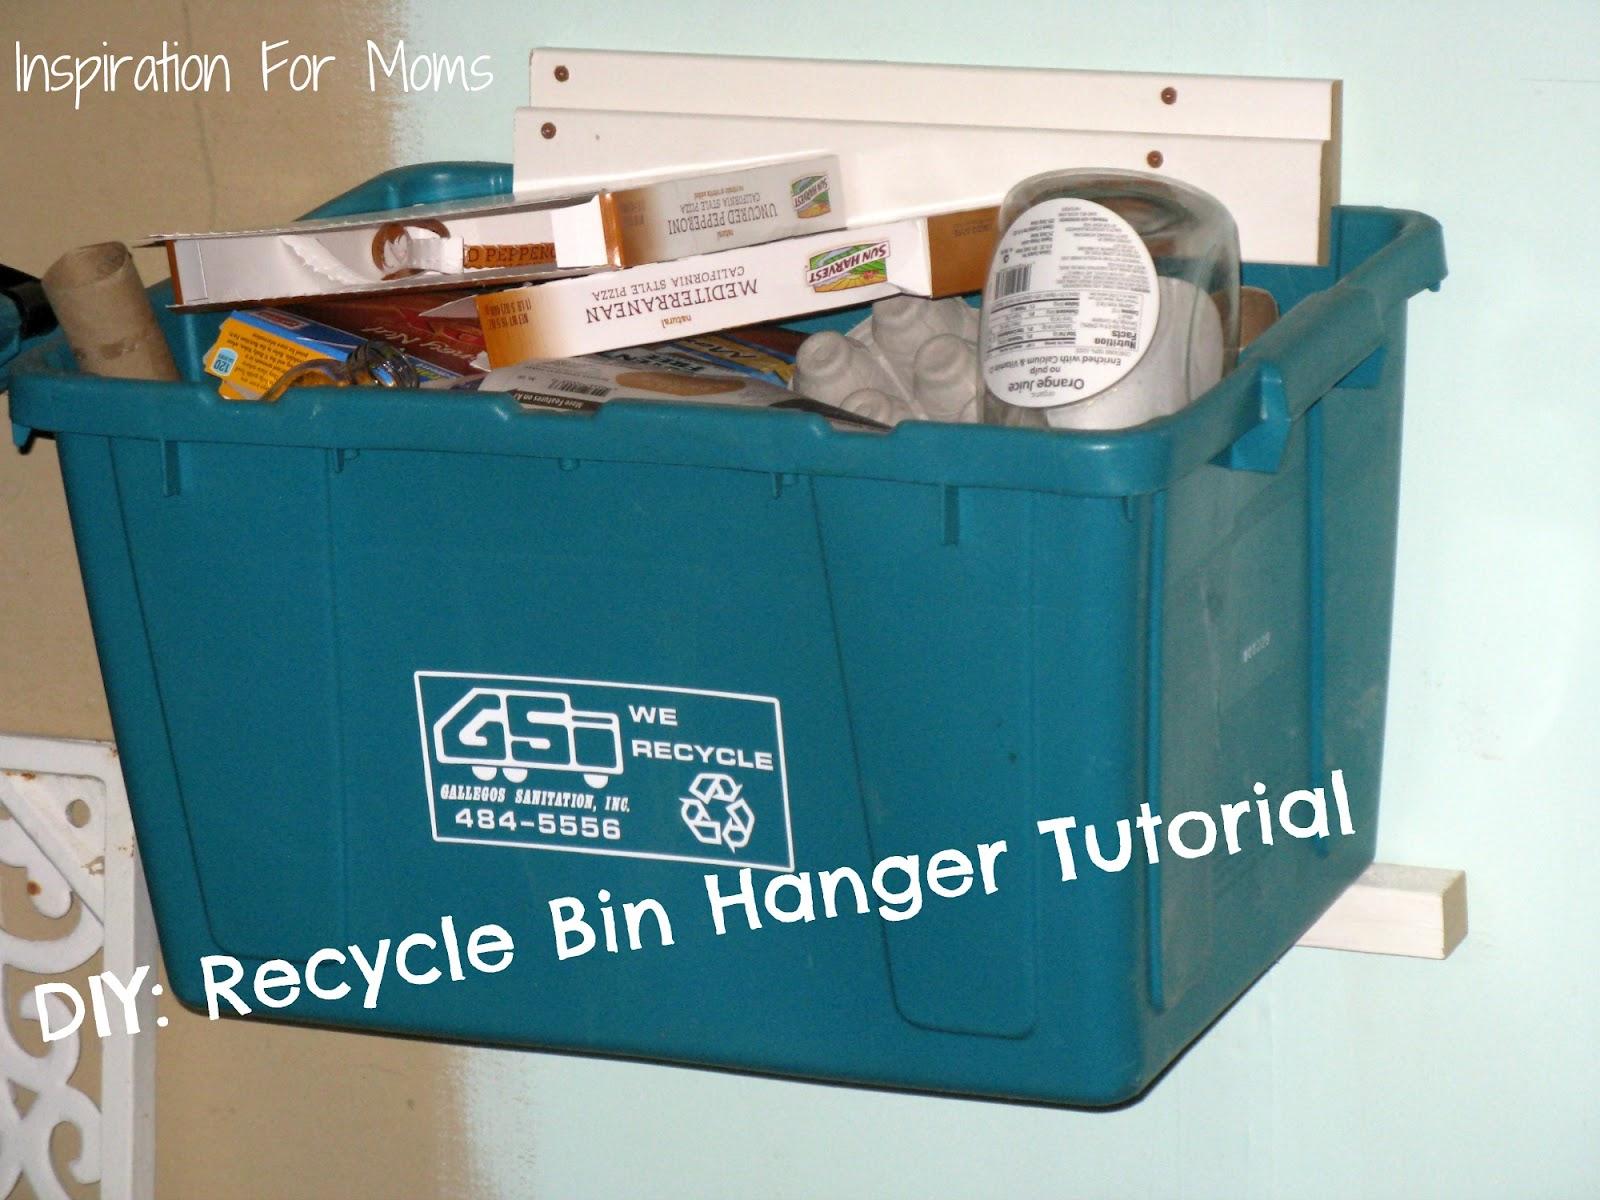 recycle bin ideas garage - DIY Recycle Bin Hanger Tutorial Inspiration For Moms